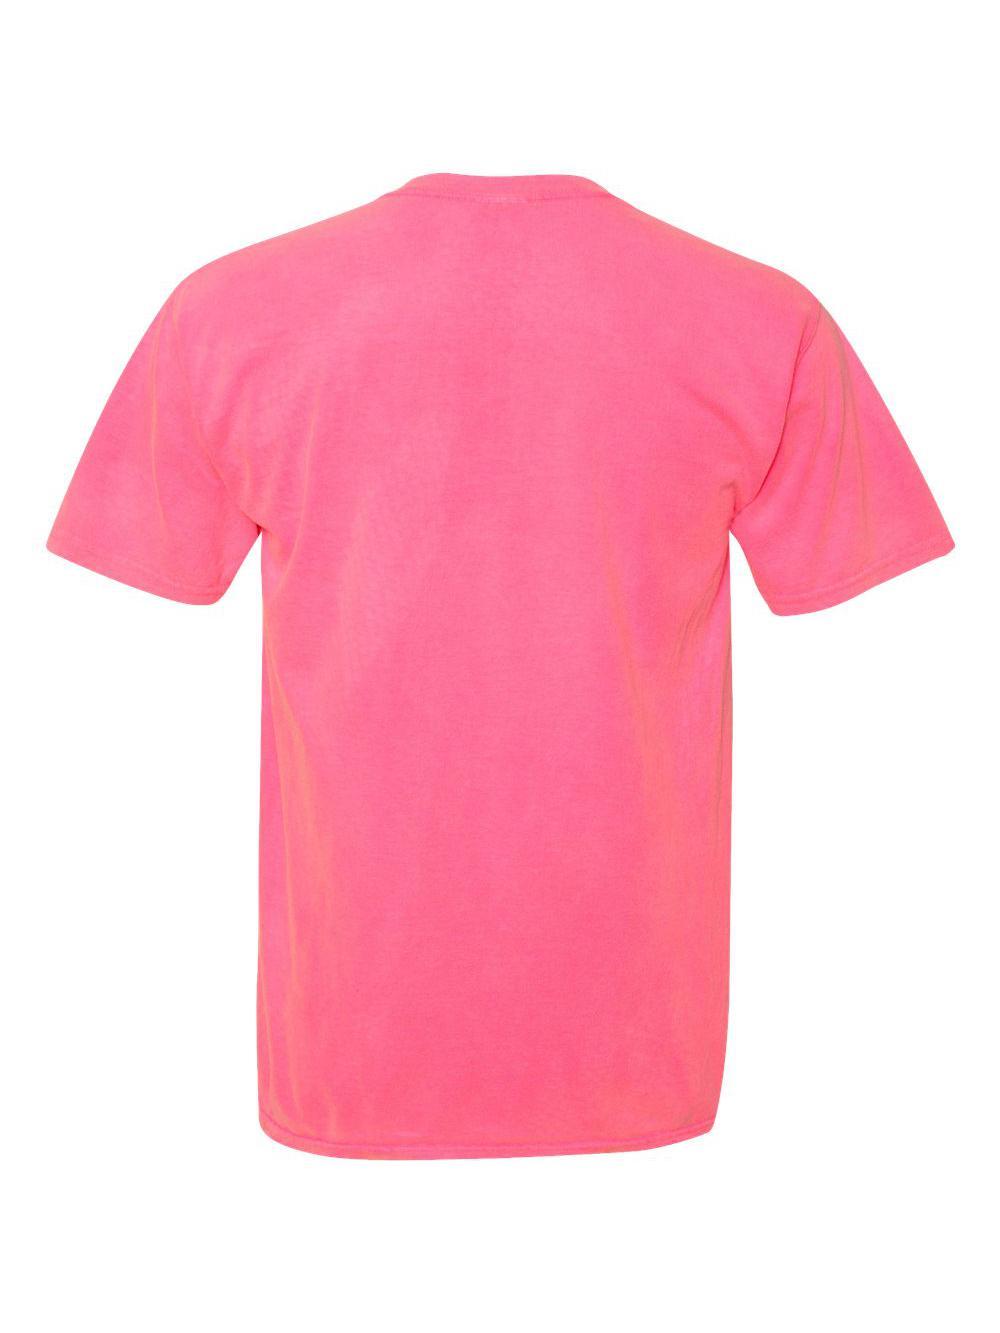 Comfort-Colors-Garment-Dyed-Heavyweight-Ringspun-Short-Sleeve-Shirt-1717 thumbnail 97